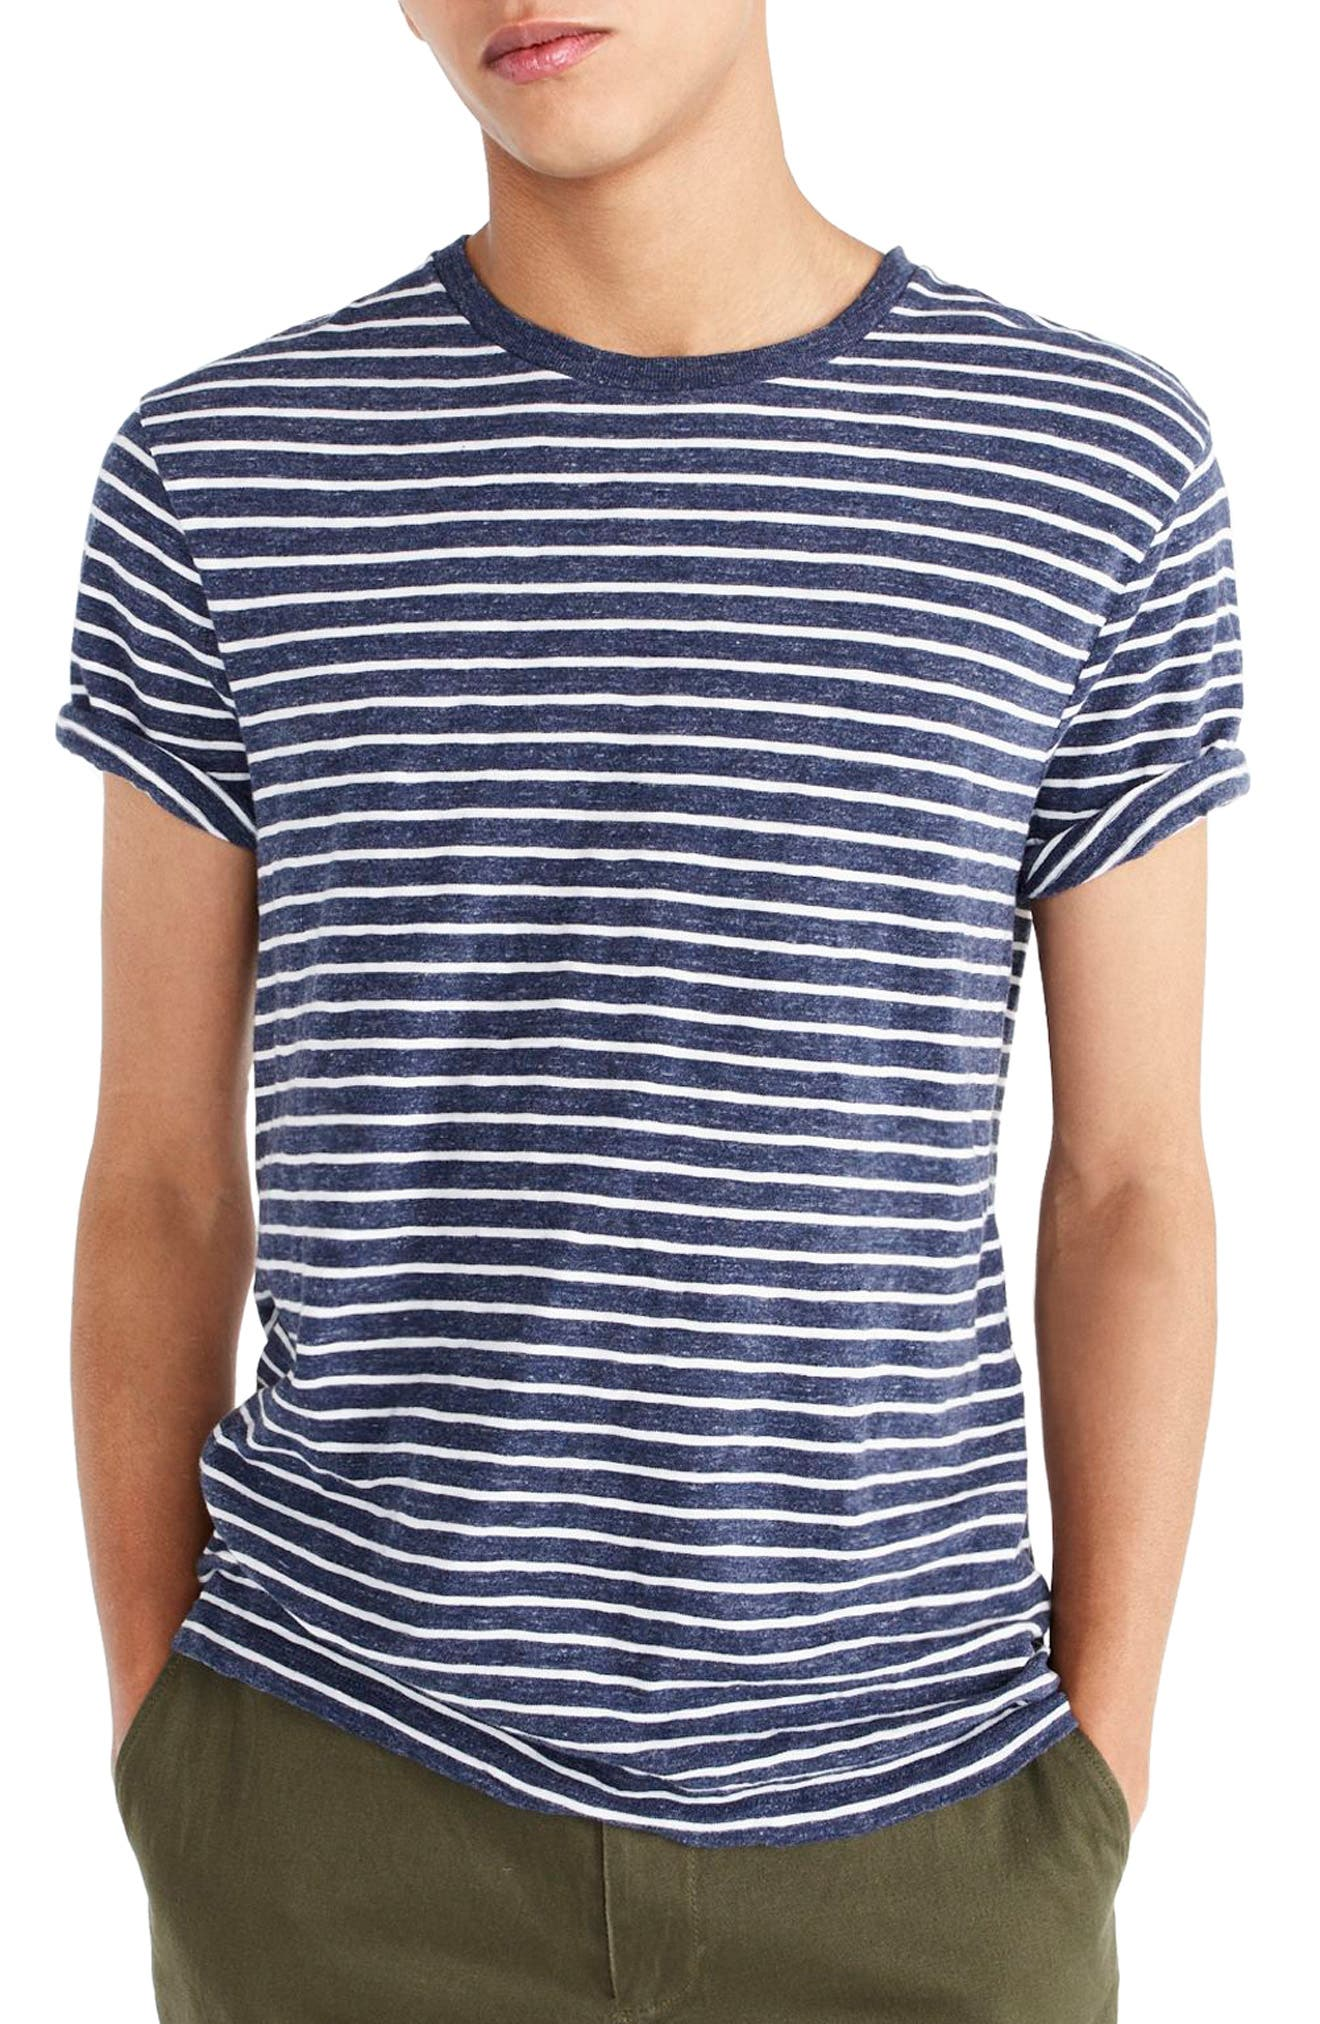 J.Crew Stripe Slub Cotton T-Shirt,                         Main,                         color, Heather Ink